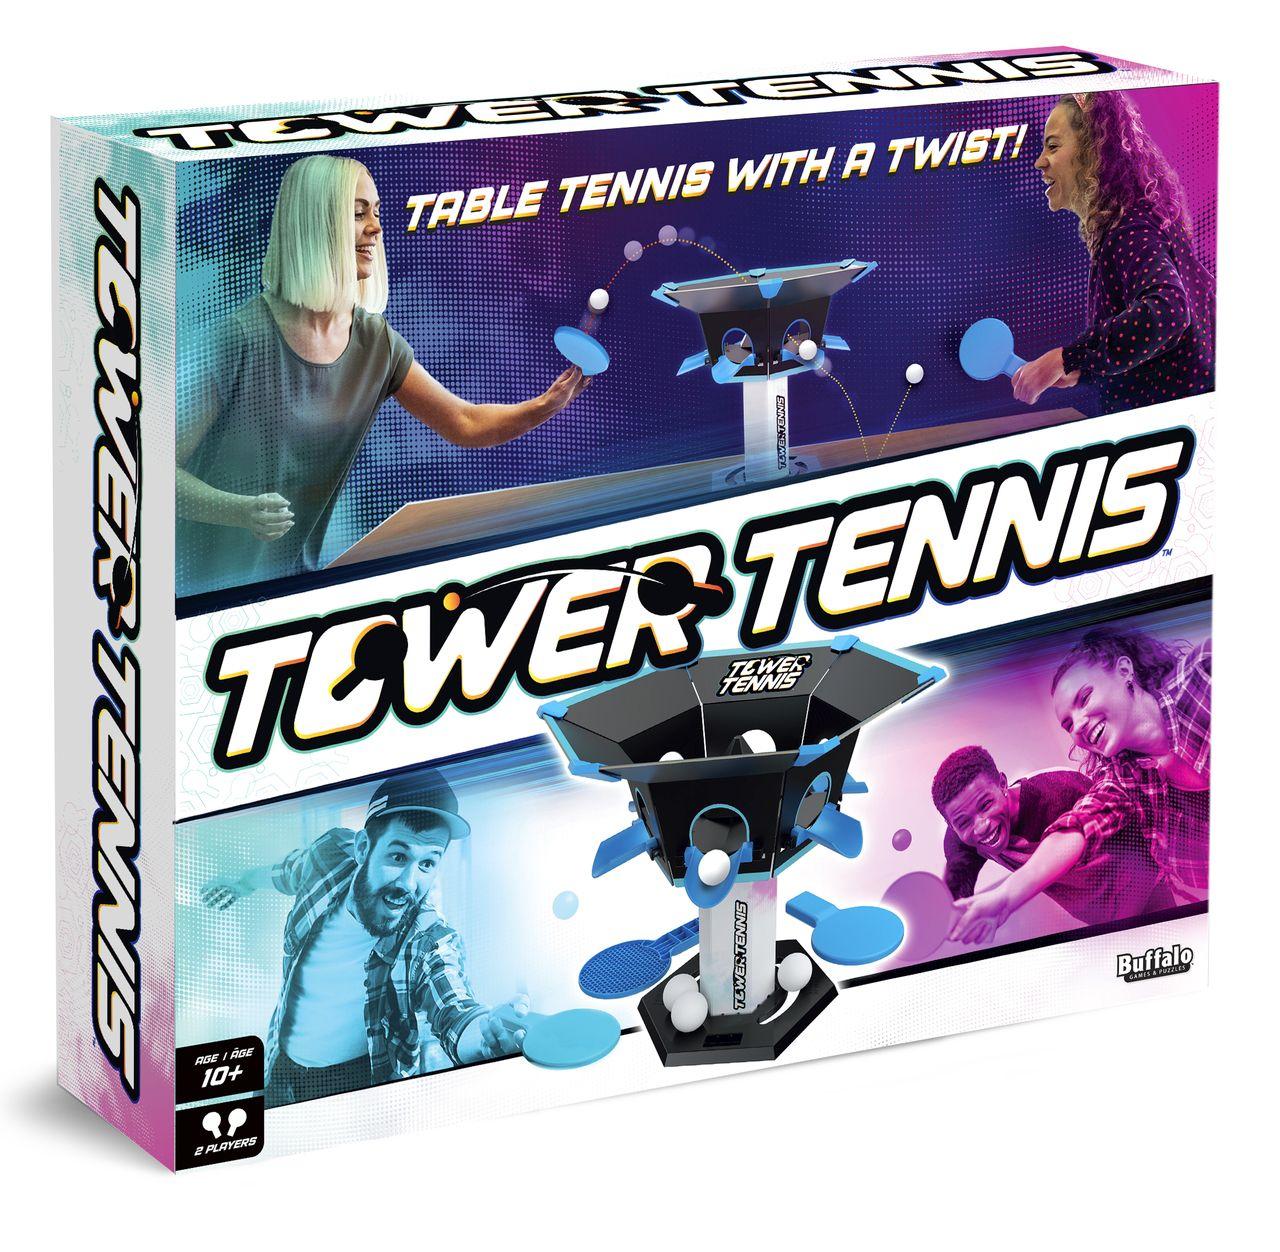 Tower Tennis - Buffalo Games #boardgame #skillgame #game #pingpong #tabletennis